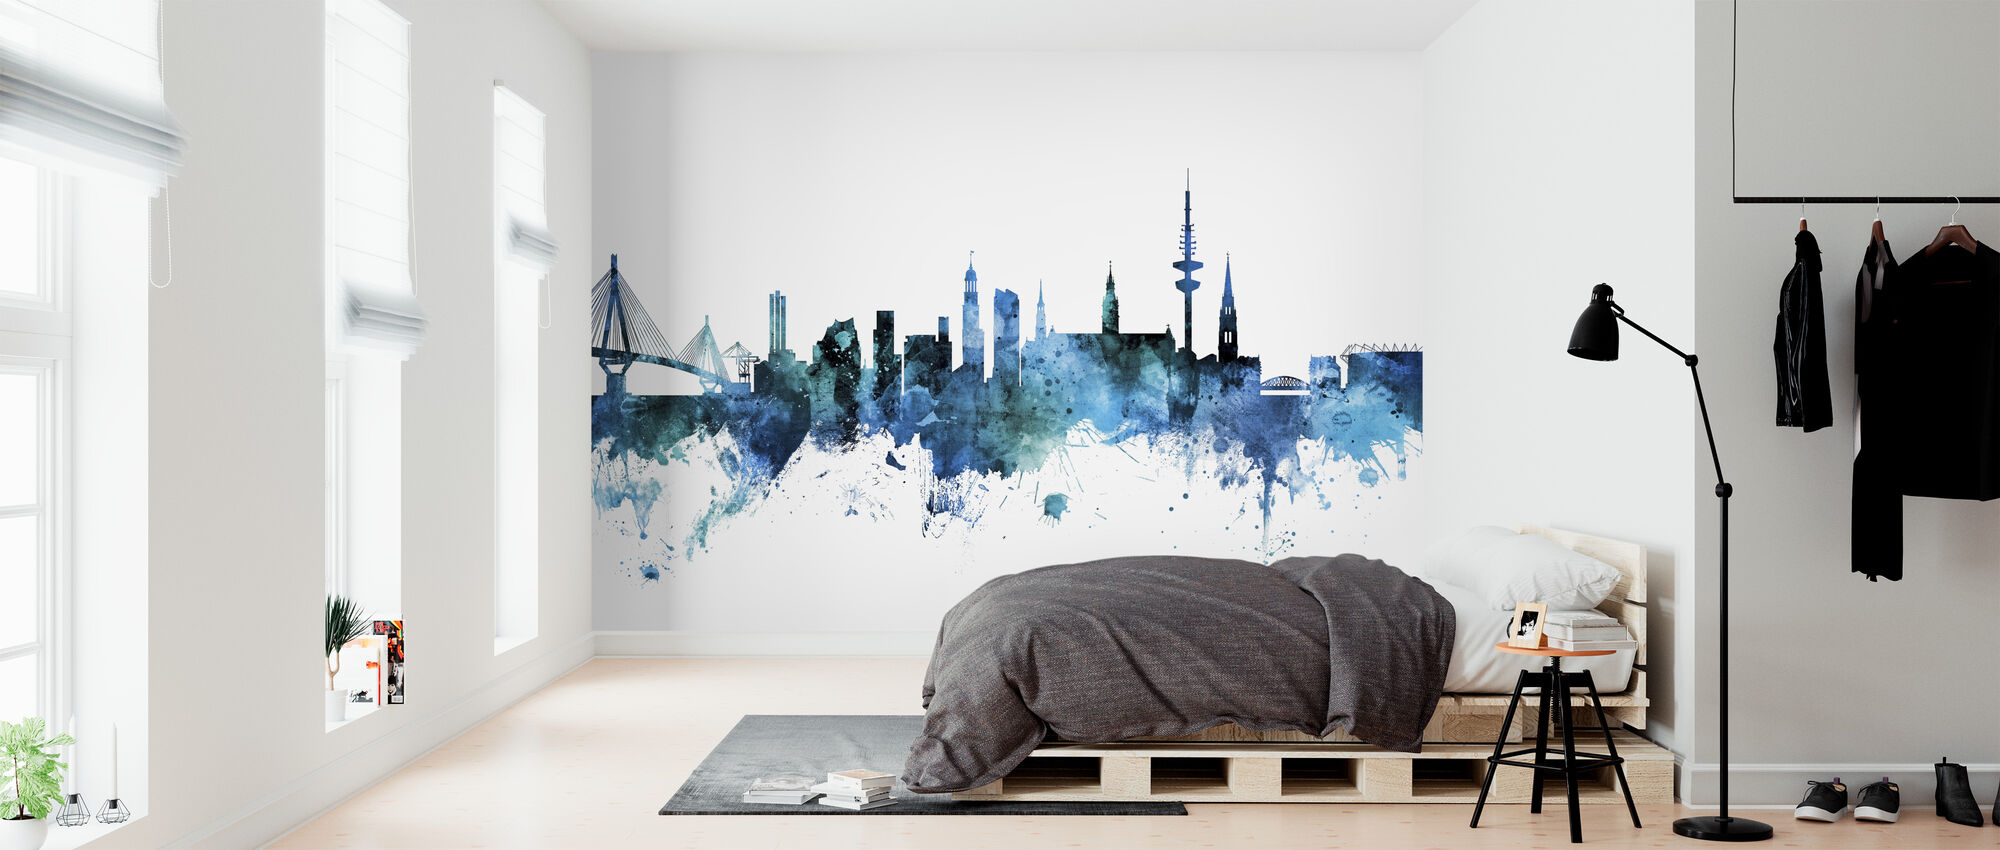 Hamburg Germany Skyline - Wallpaper - Bedroom